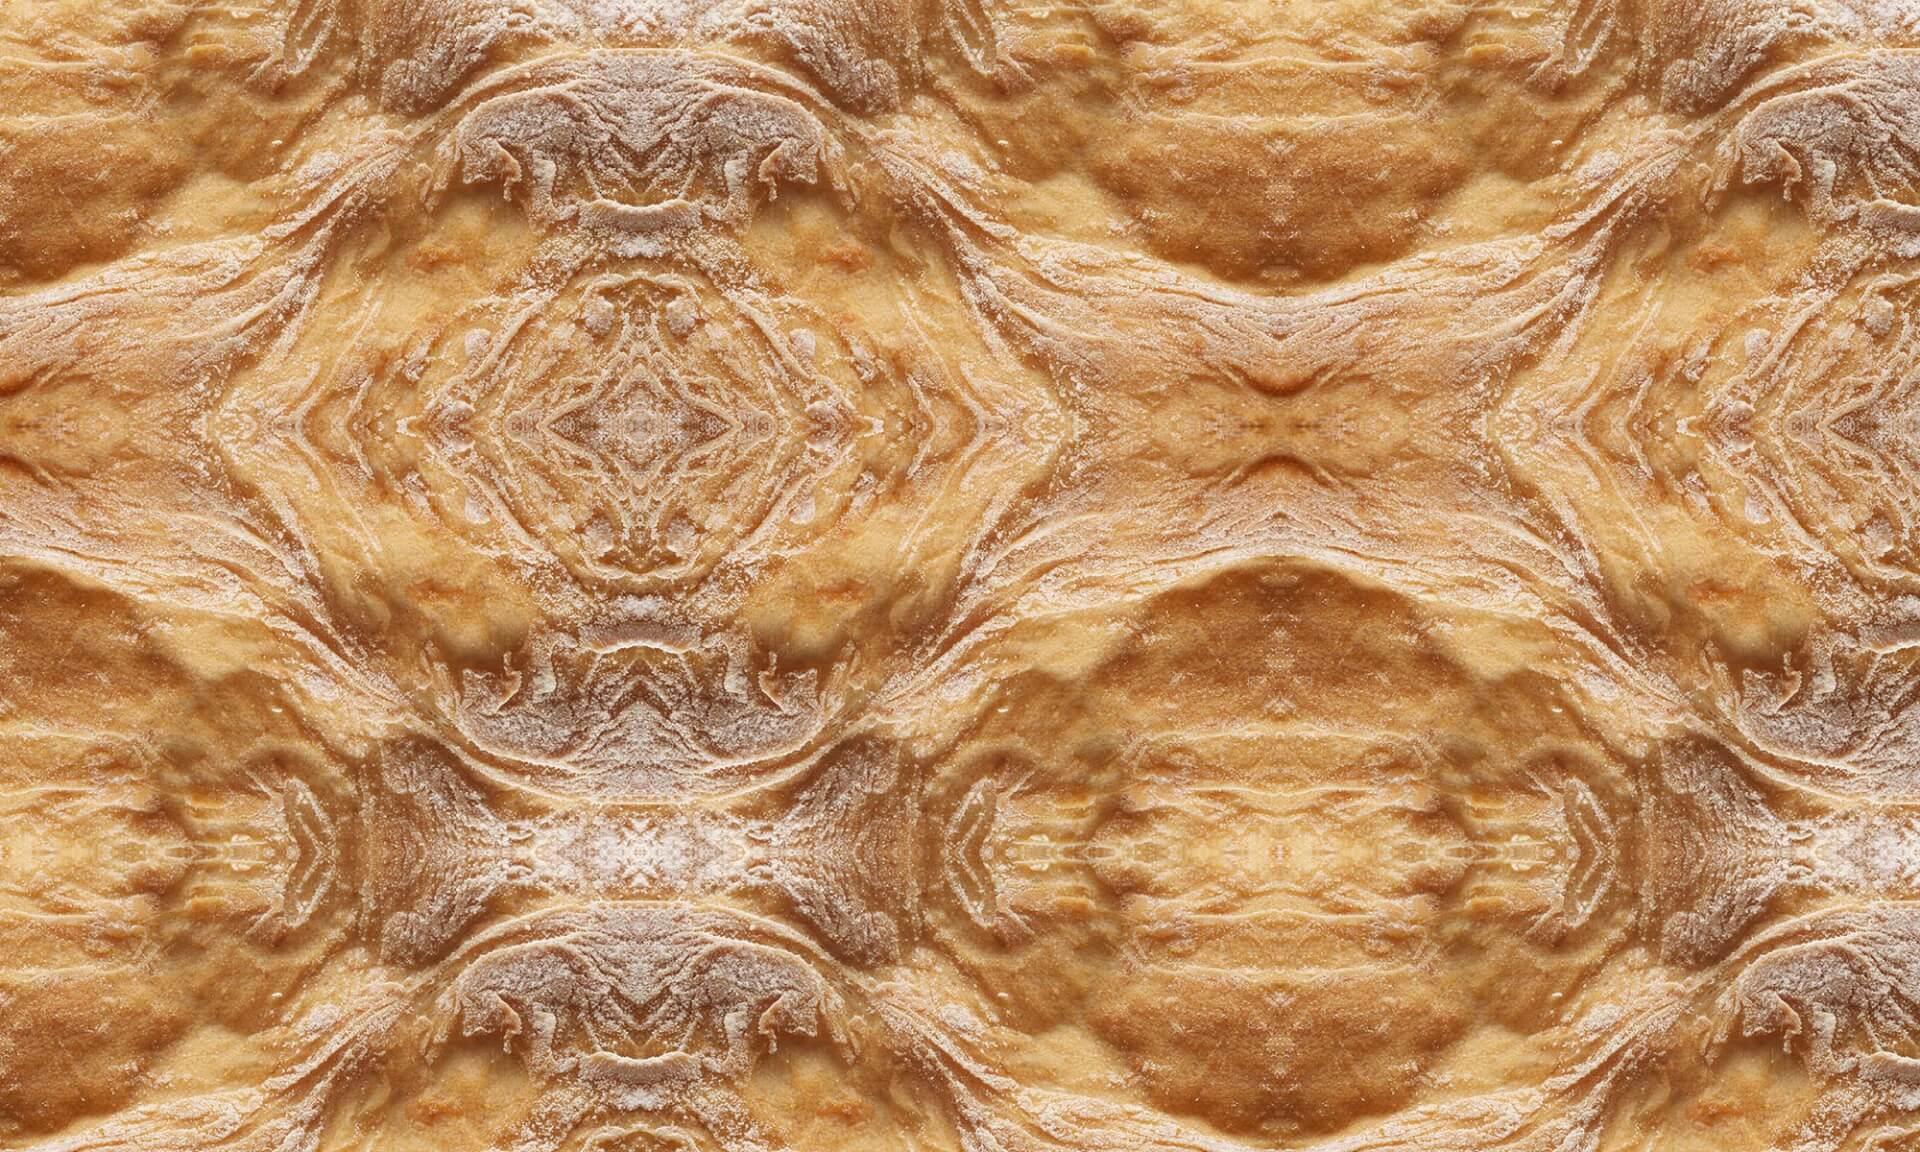 Southwestern Spun (Bread-2) Doug Garrabrants